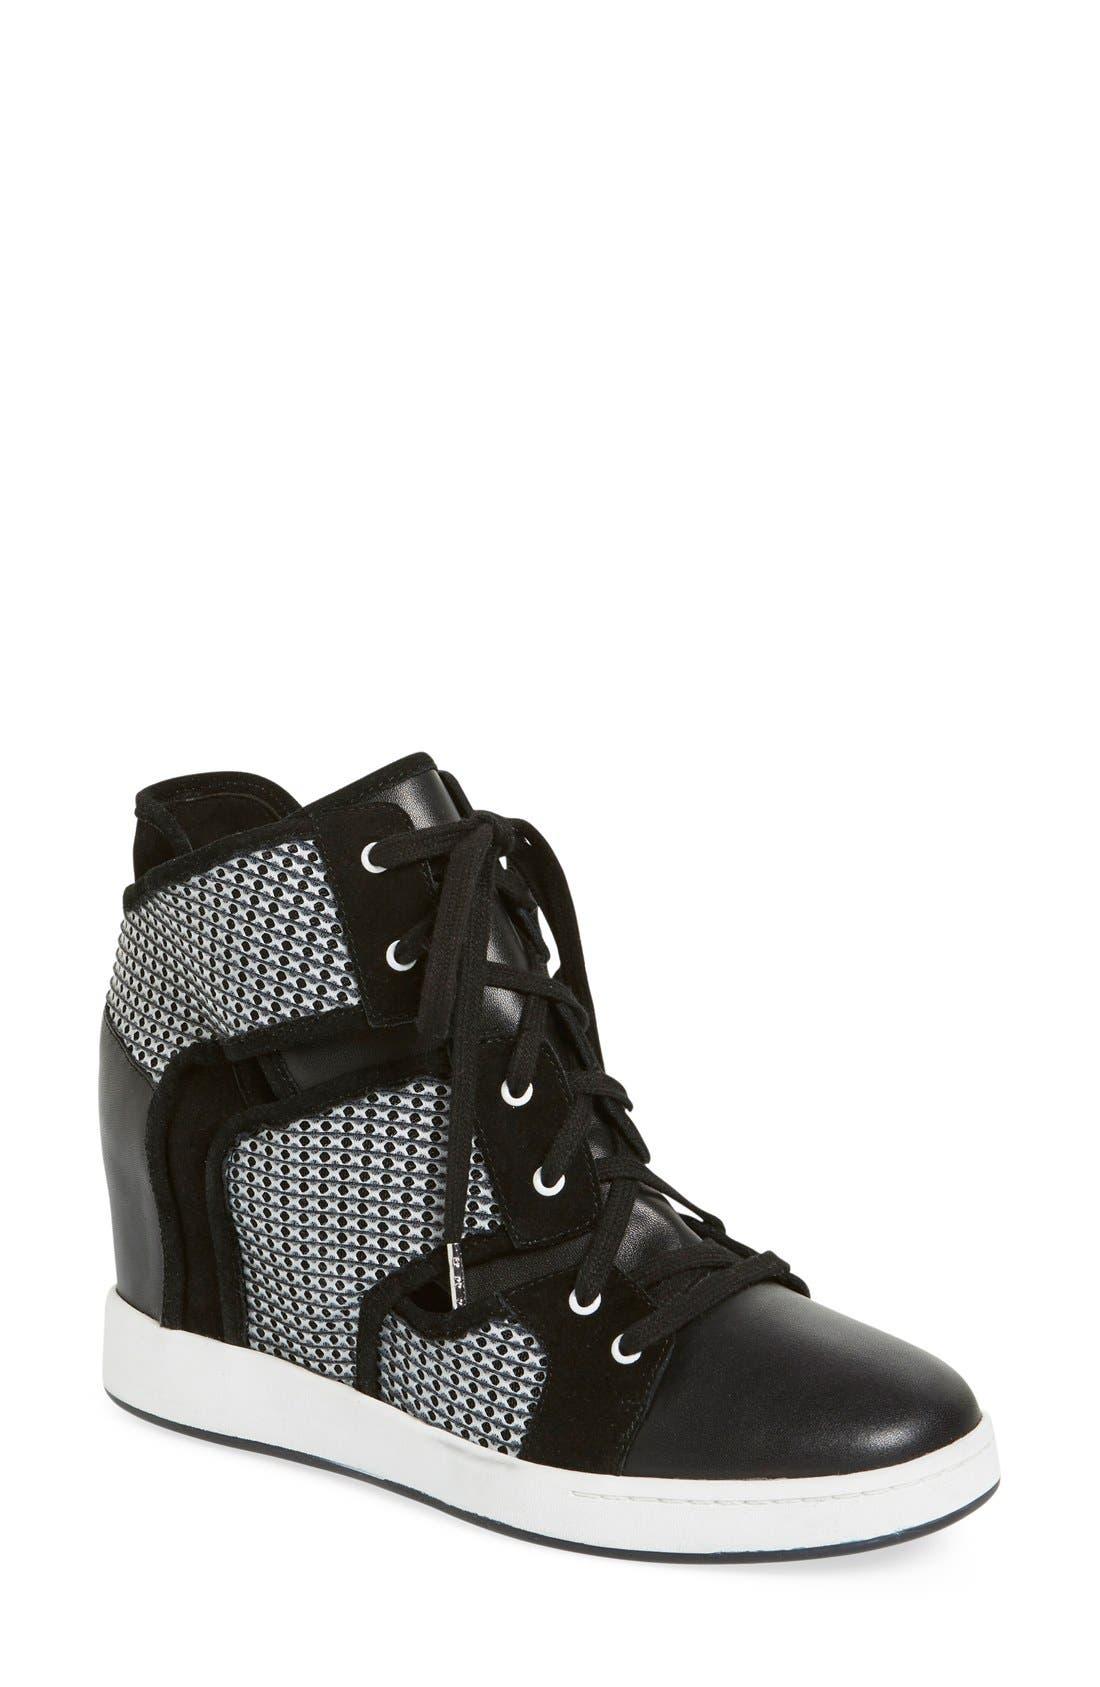 Alternate Image 1 Selected - L.A.M.B. 'Gera' Hidden Wedge Sneaker (Women)